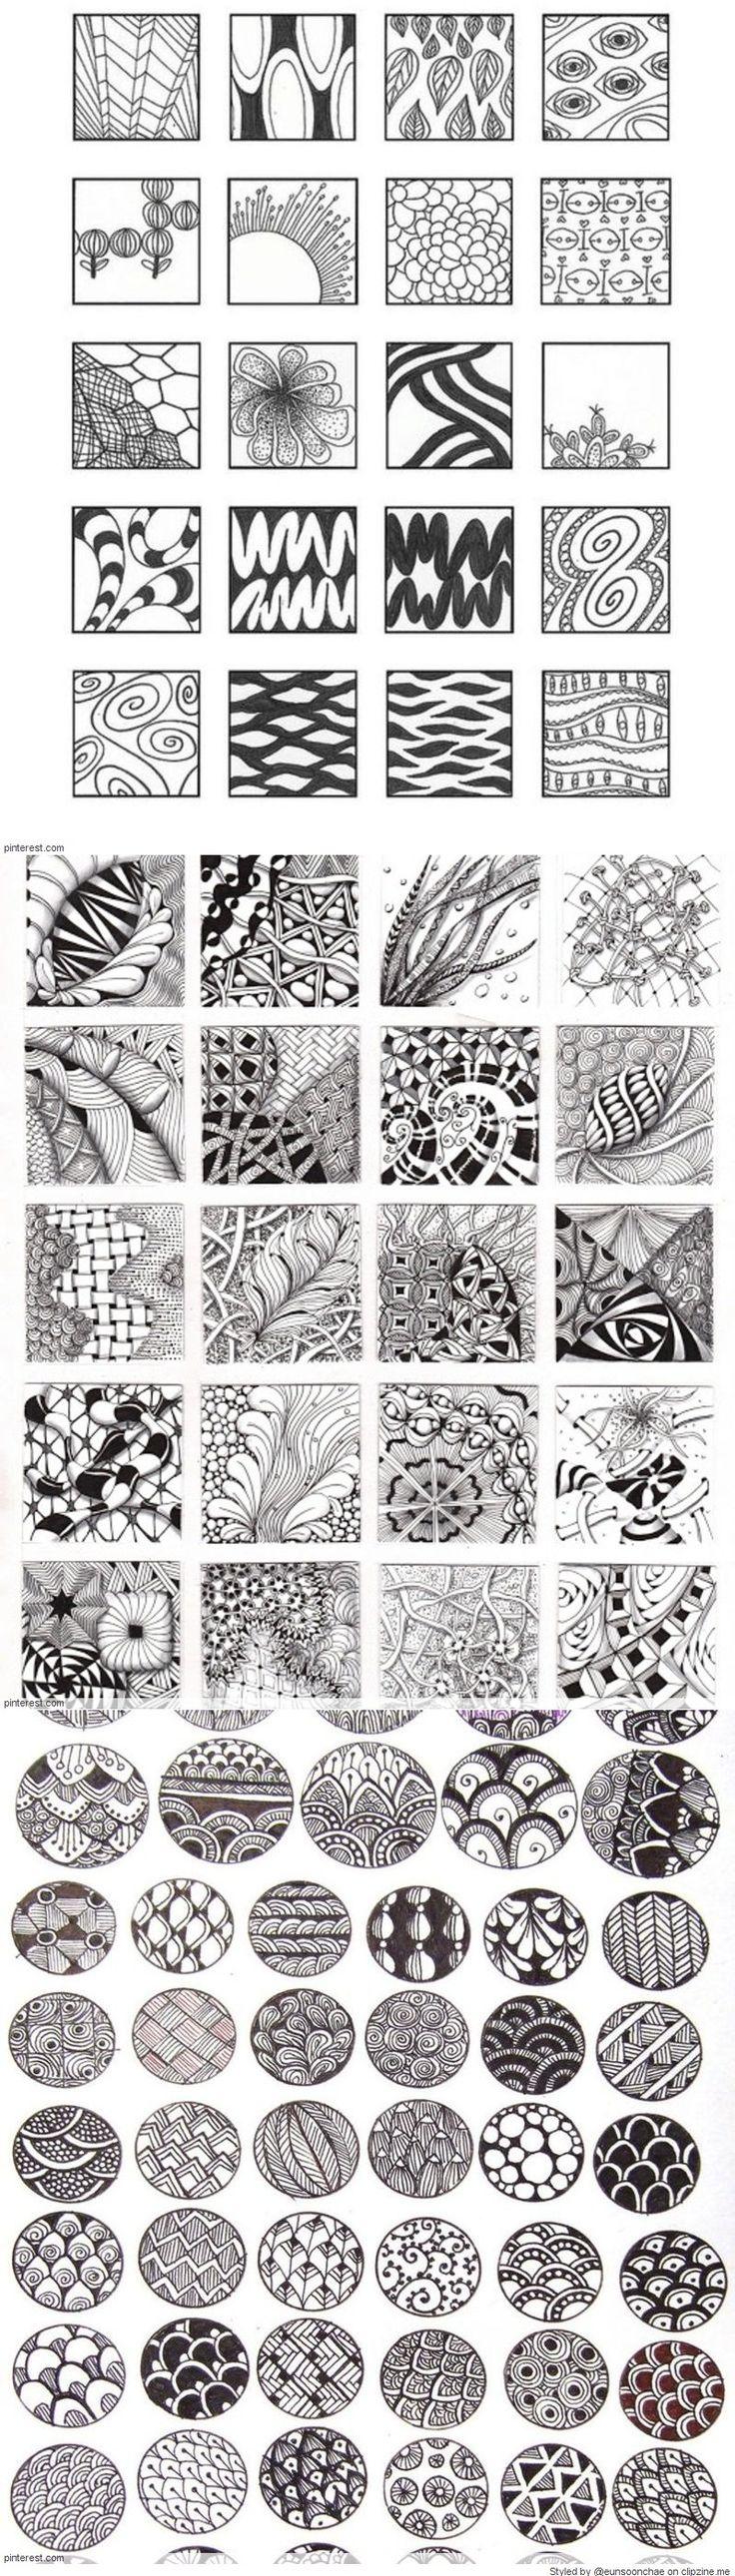 22 best malvorlagen images on Pinterest | Drawings, Flower coloring ...